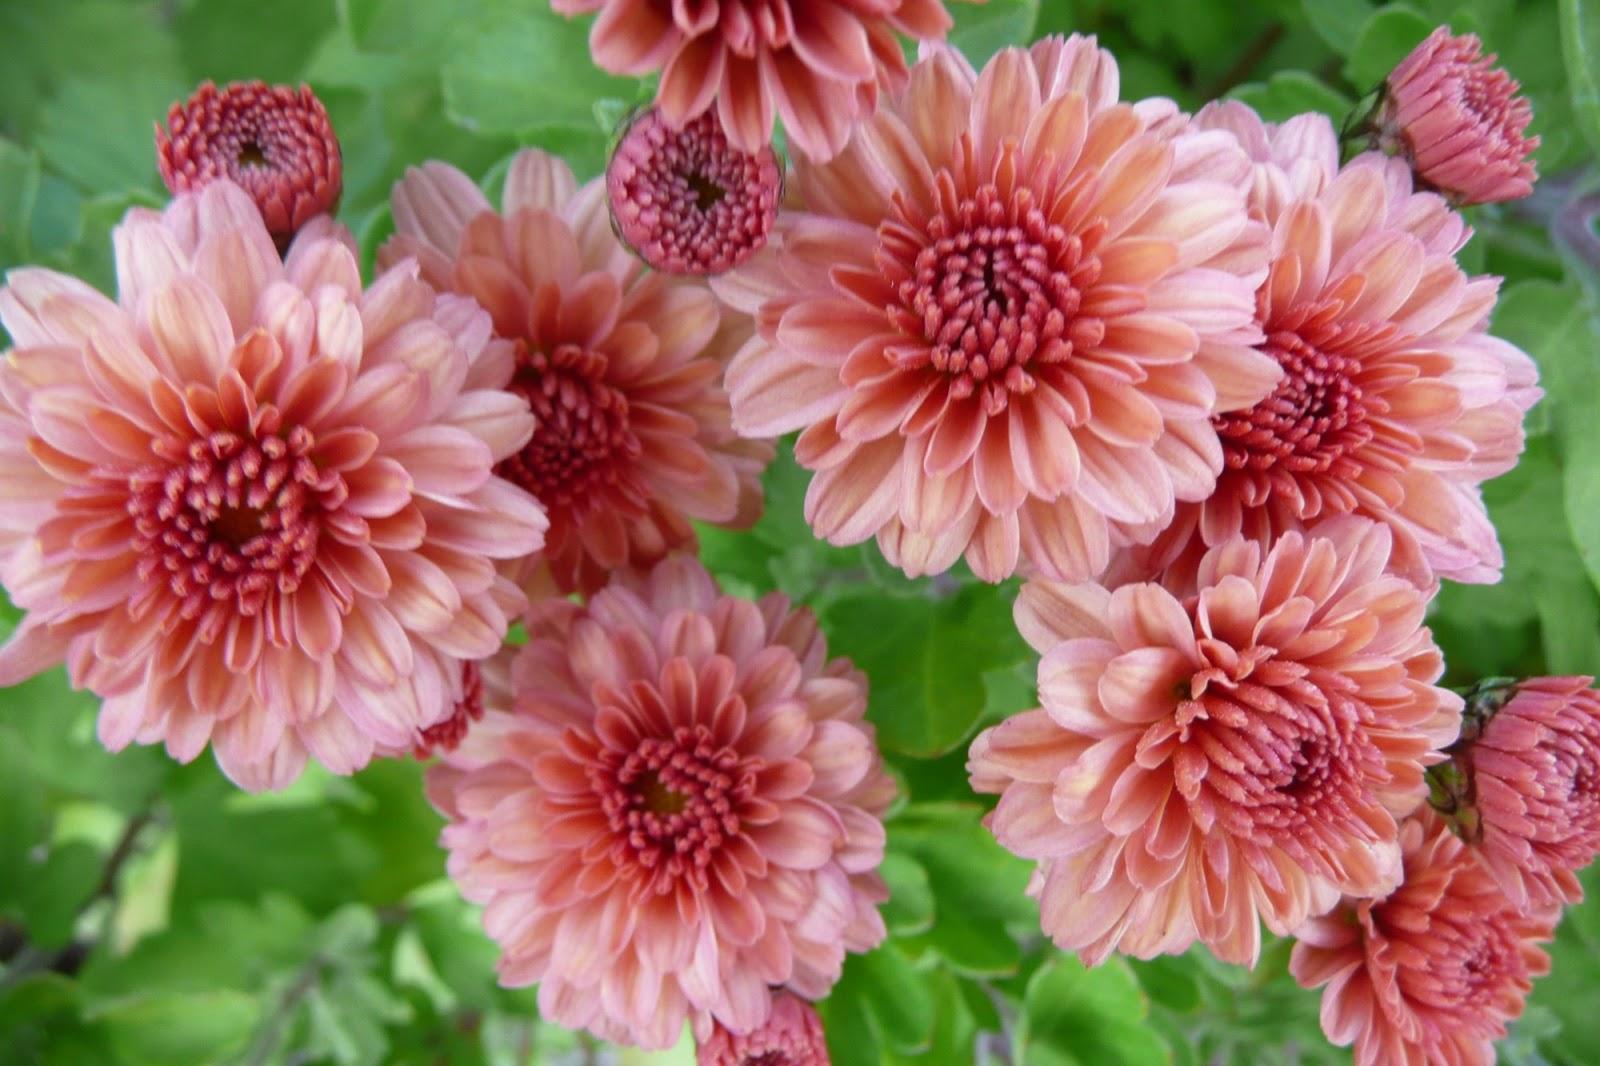 Garden at heart chrysanthemum delight